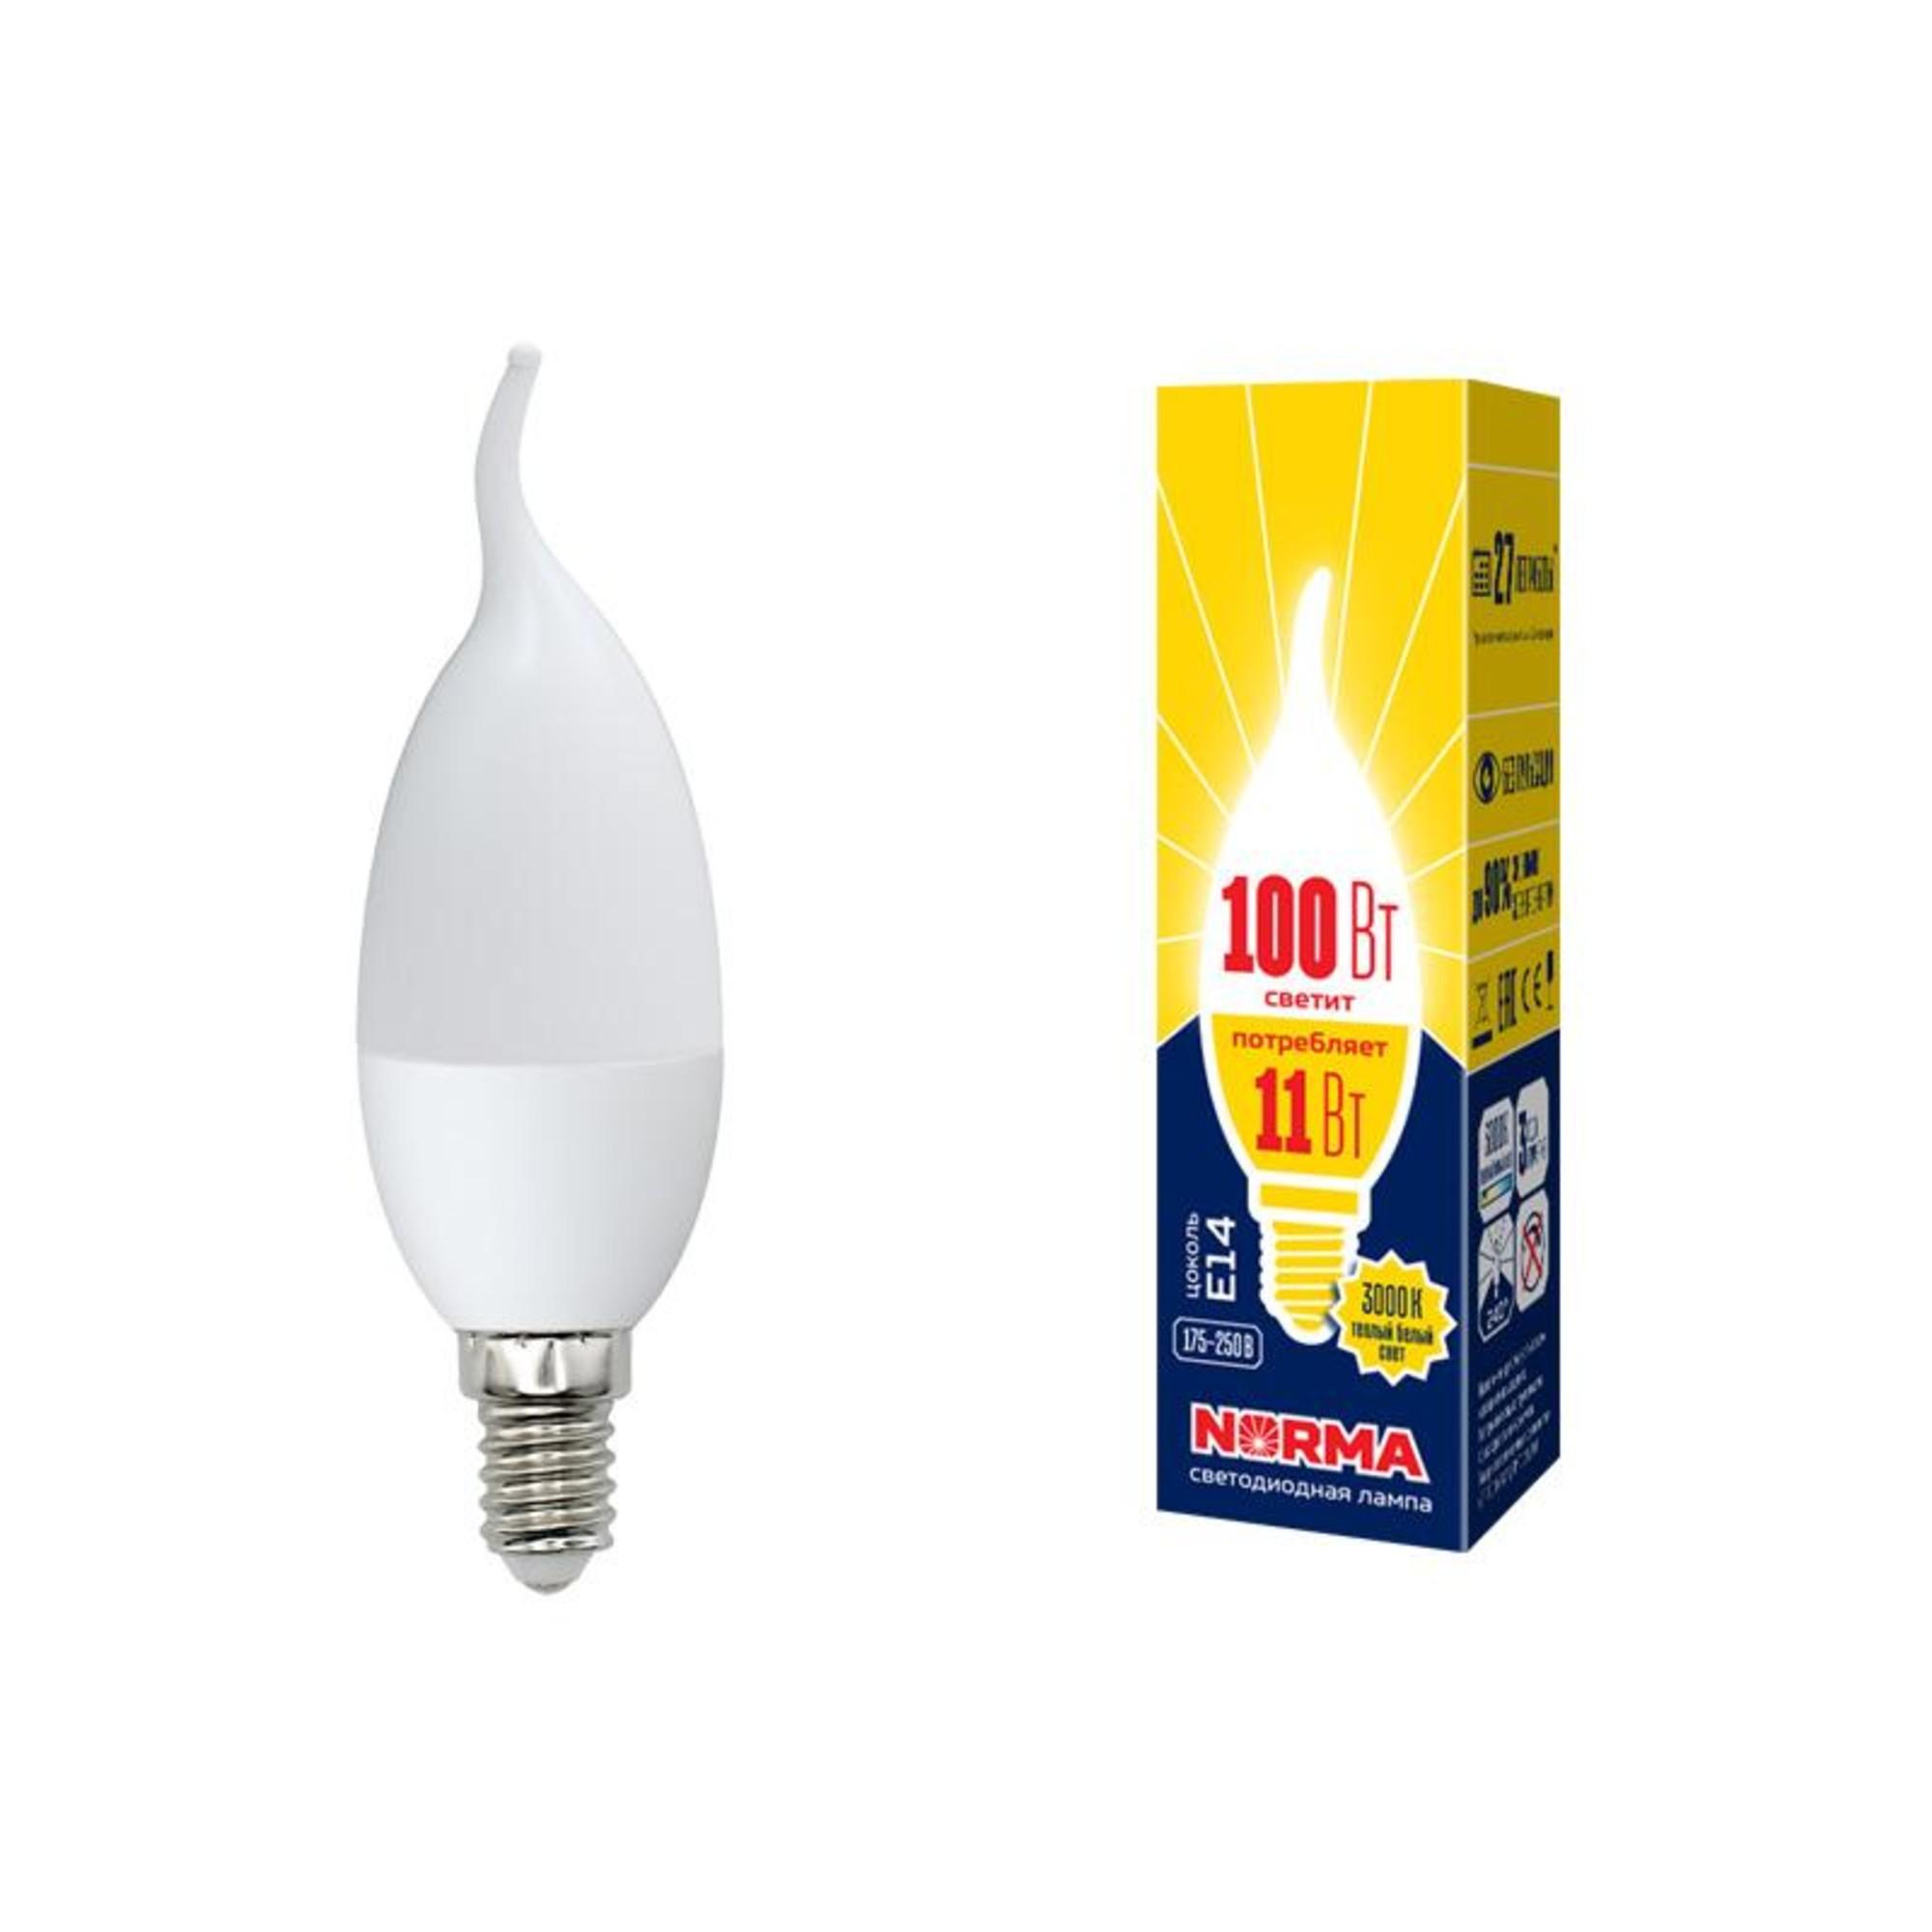 Лампа Volpe светодиодная E14 11 Вт теплый свет